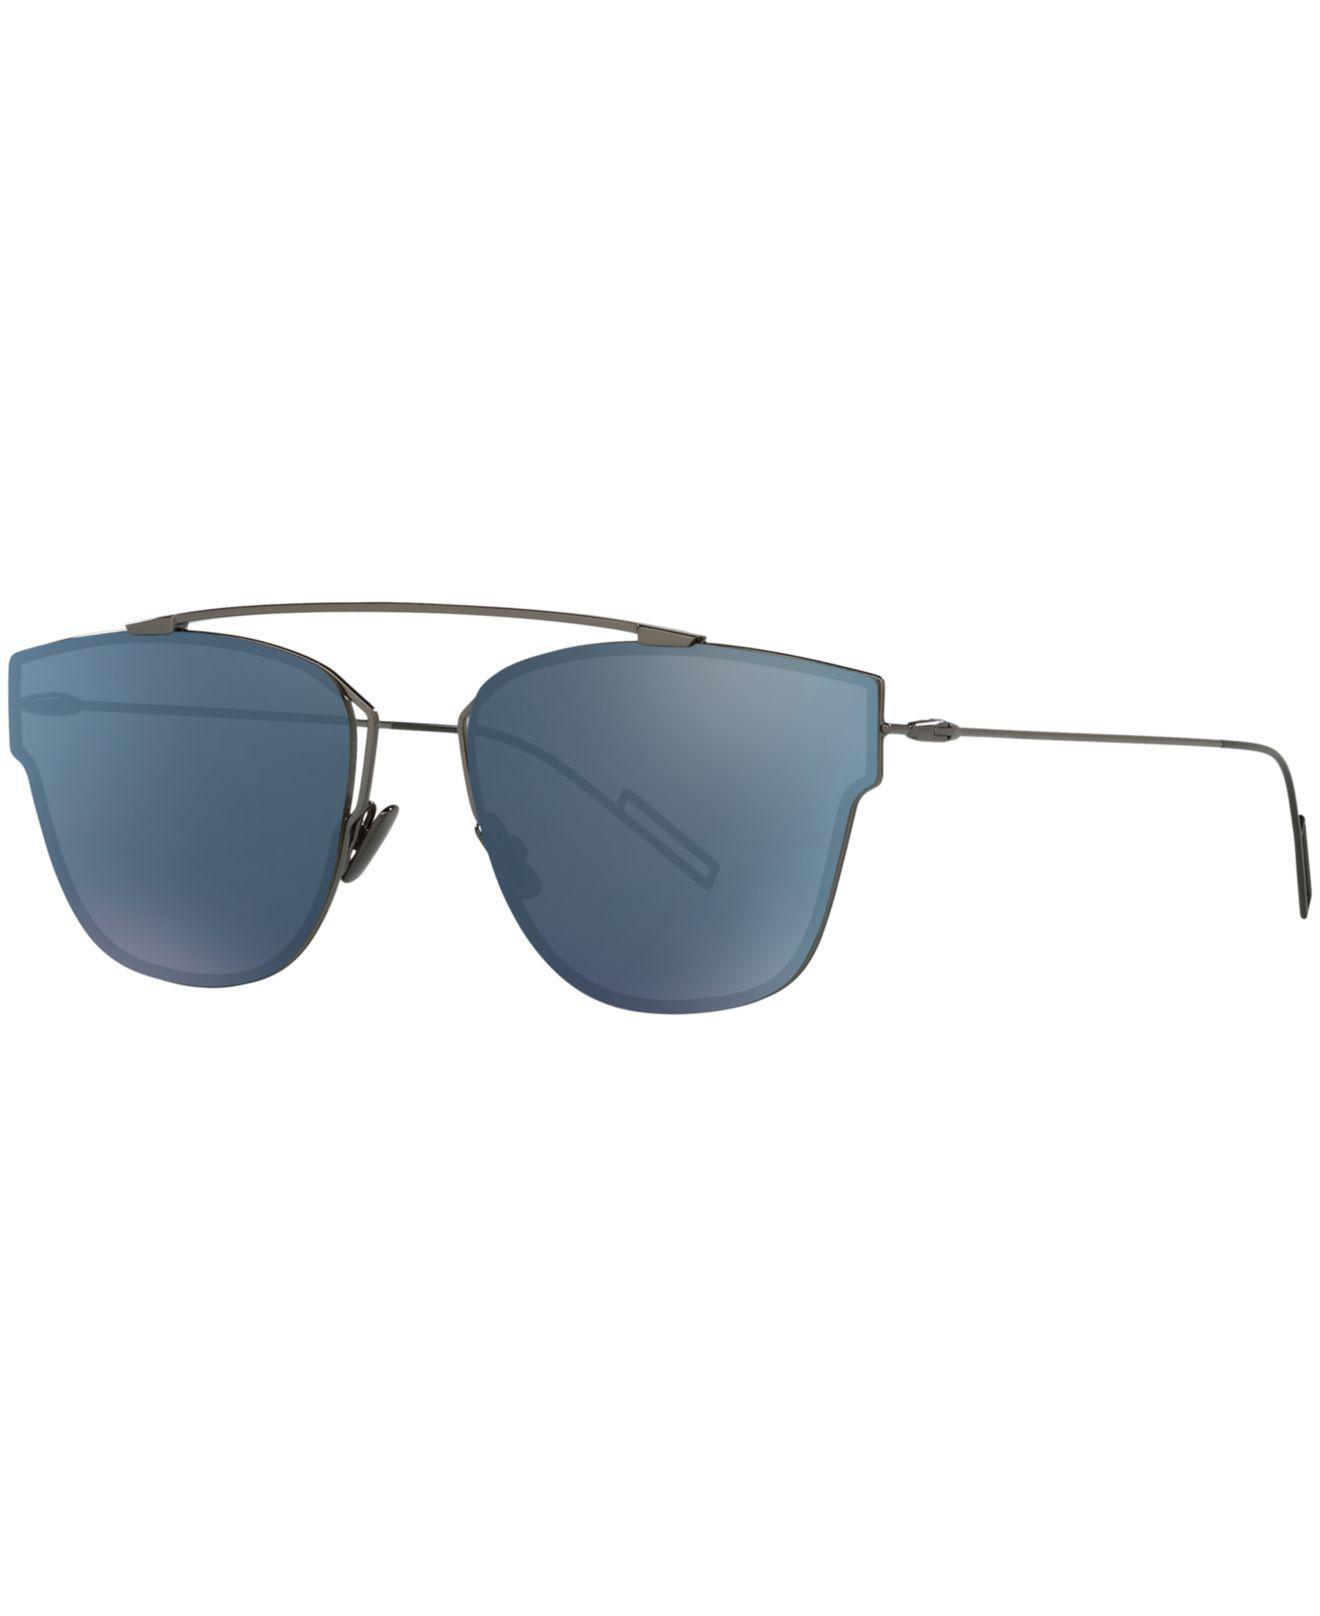 6ebd2c23a90f6 Lyst - Dior Homme Sunglasses